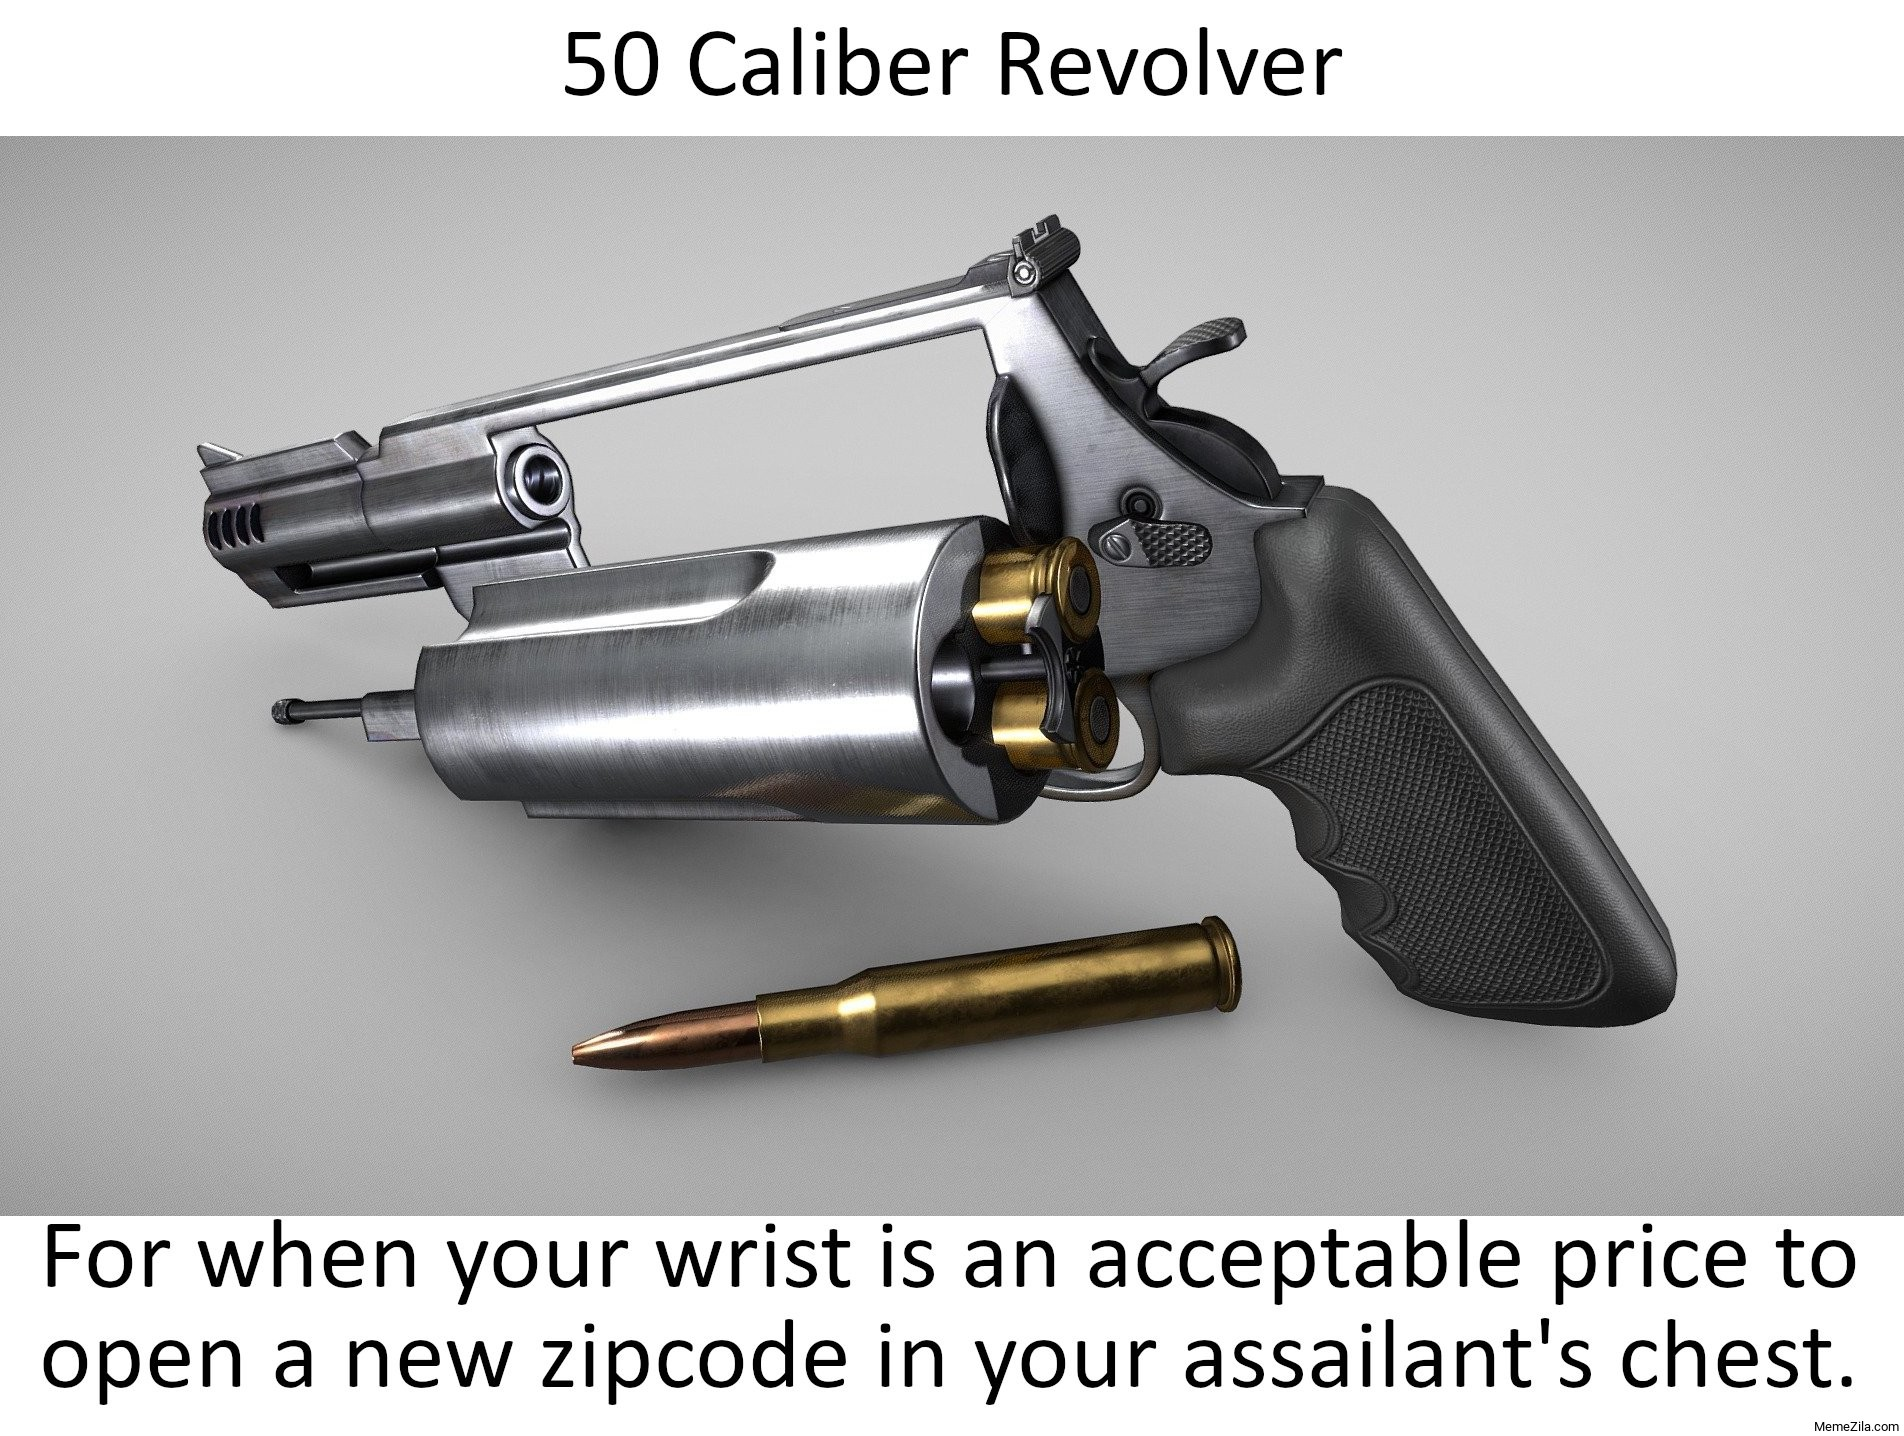 50 caliber revolver meme